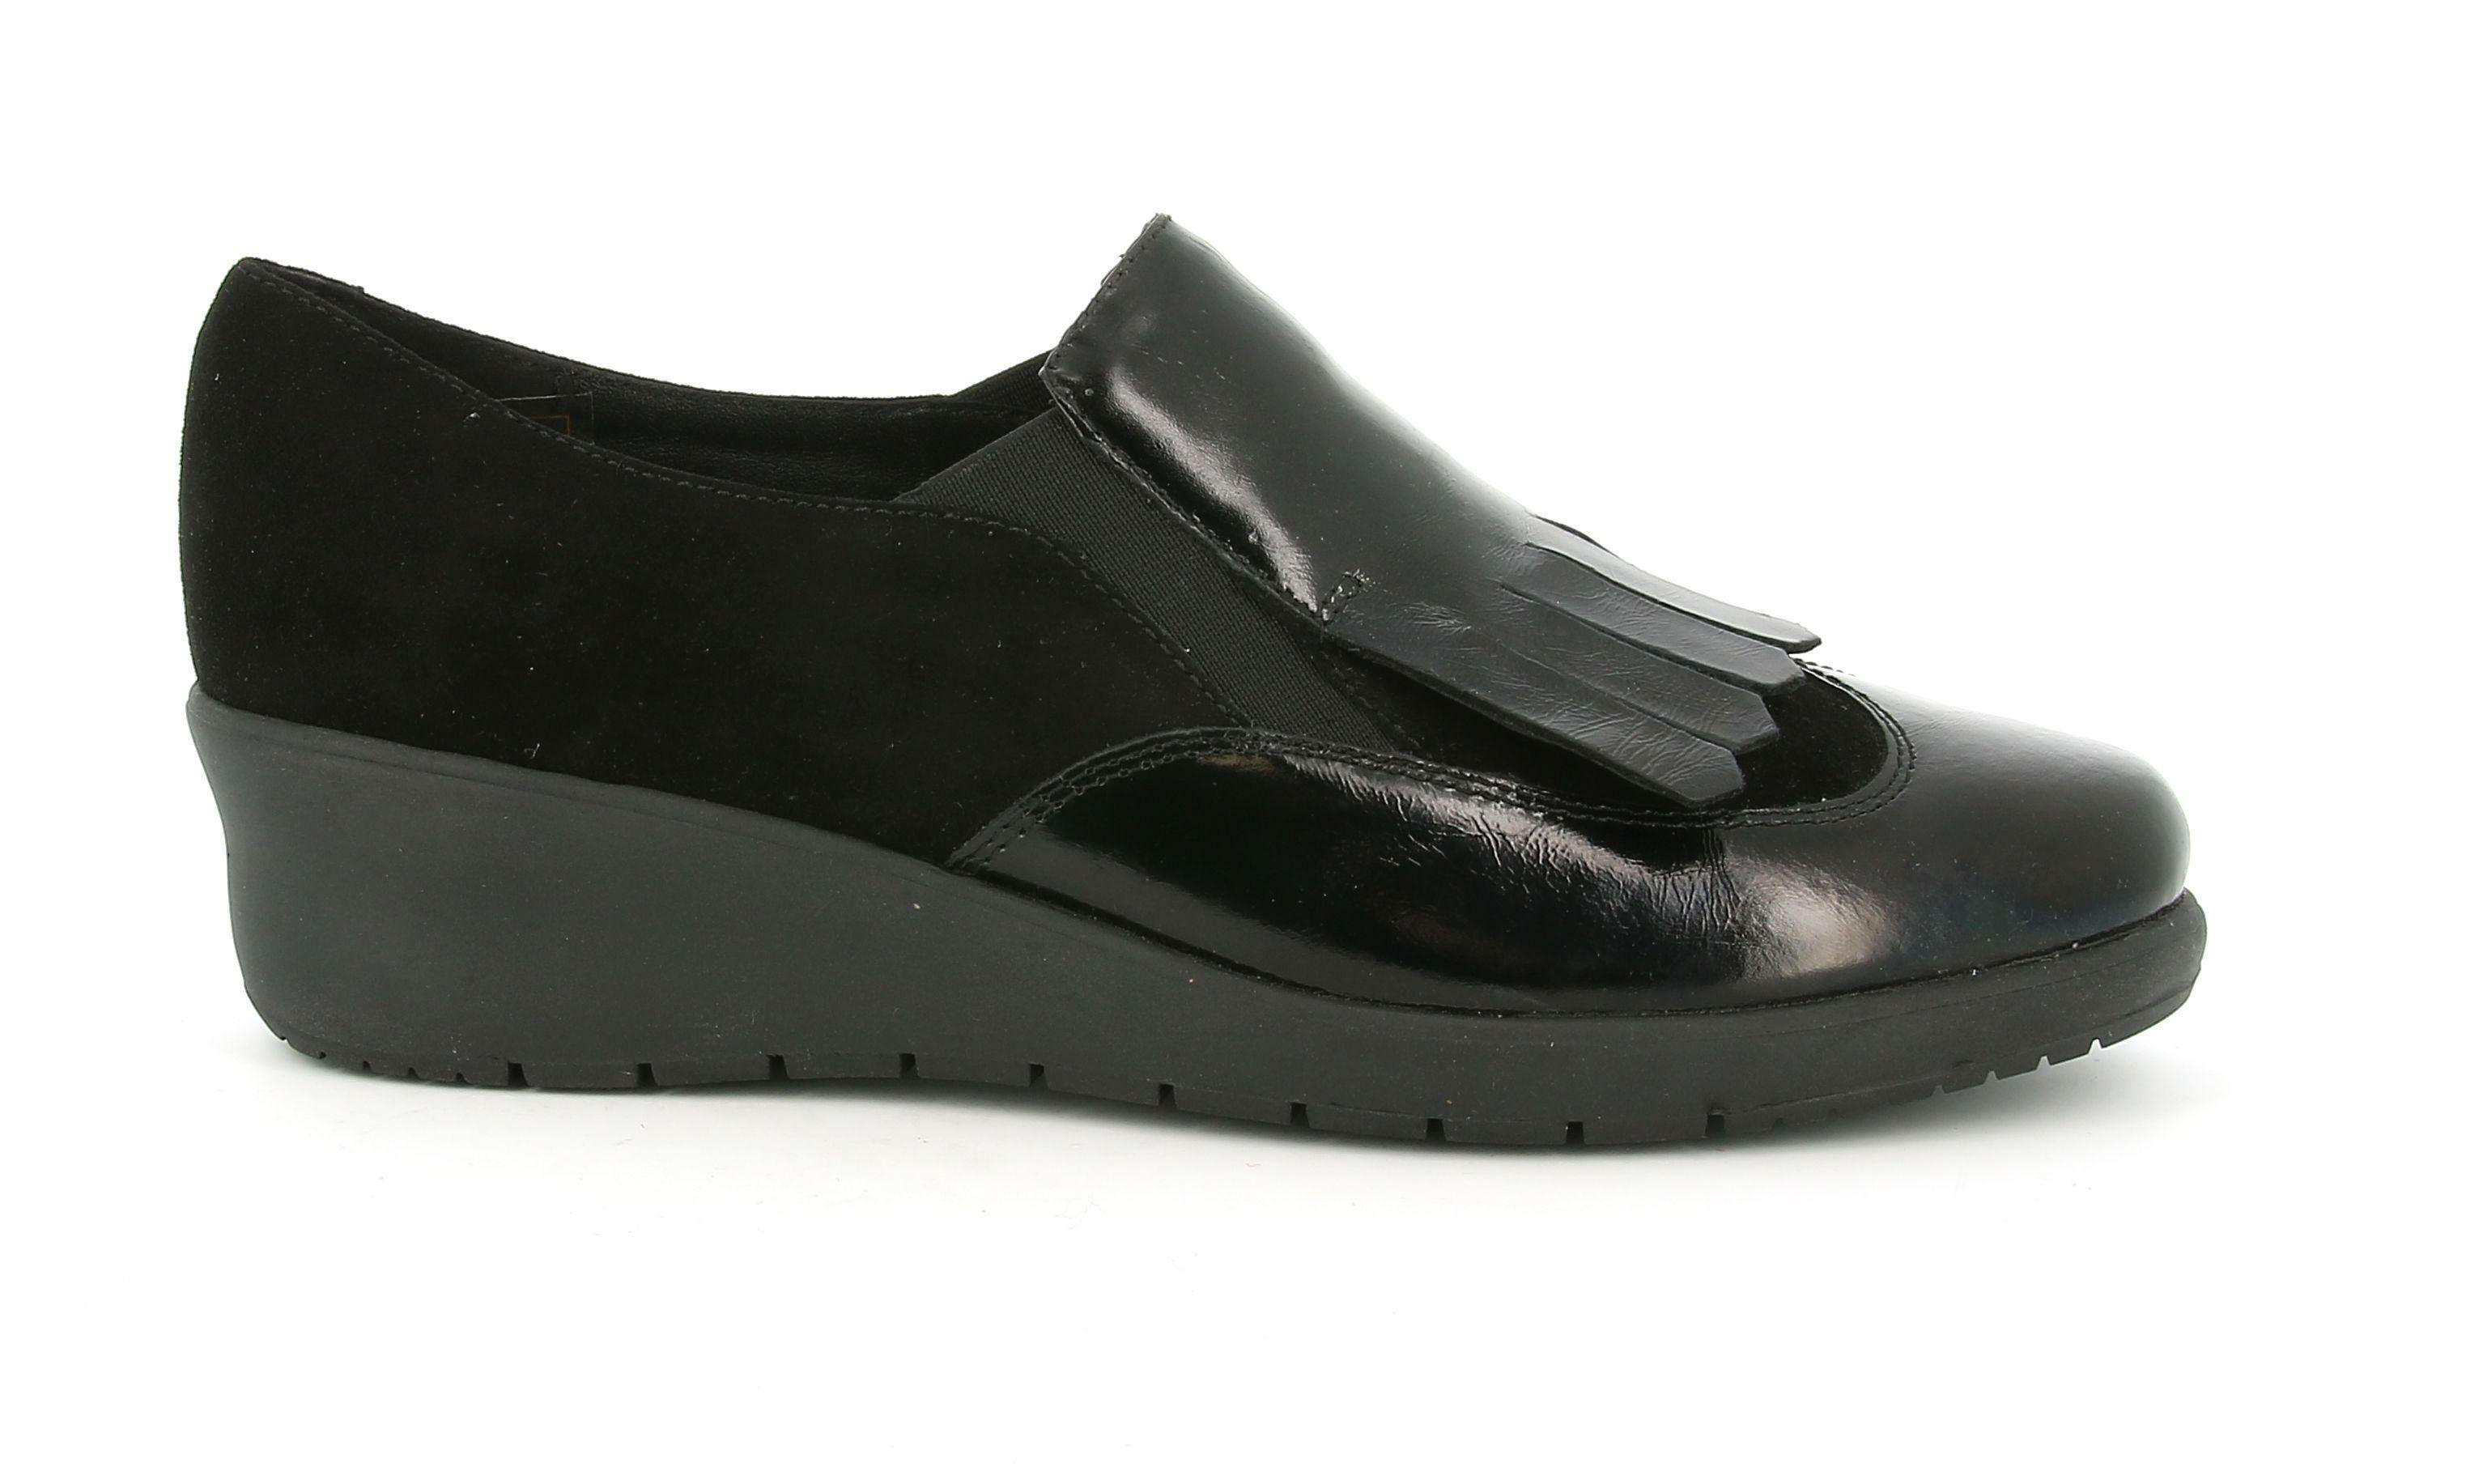 grunland grunland sc5008 88erga scarpa donna mocassino nero